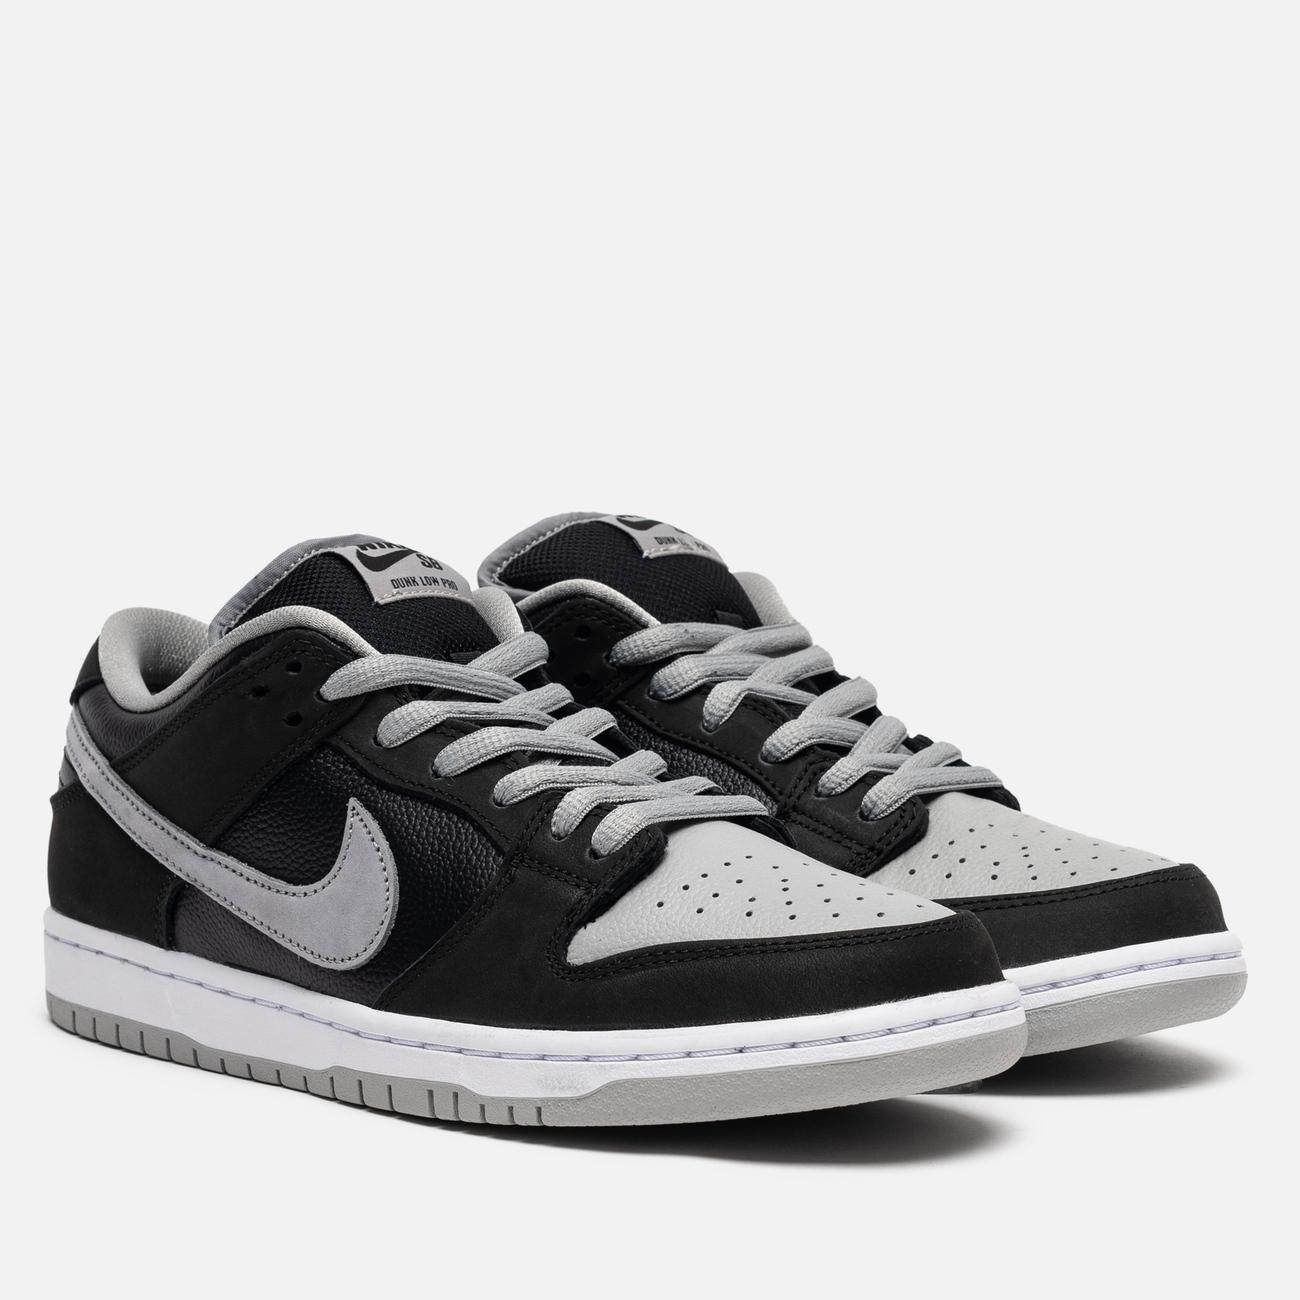 Мужские кроссовки Nike SB Dunk Low Pro Black/Medium Grey/Black/White